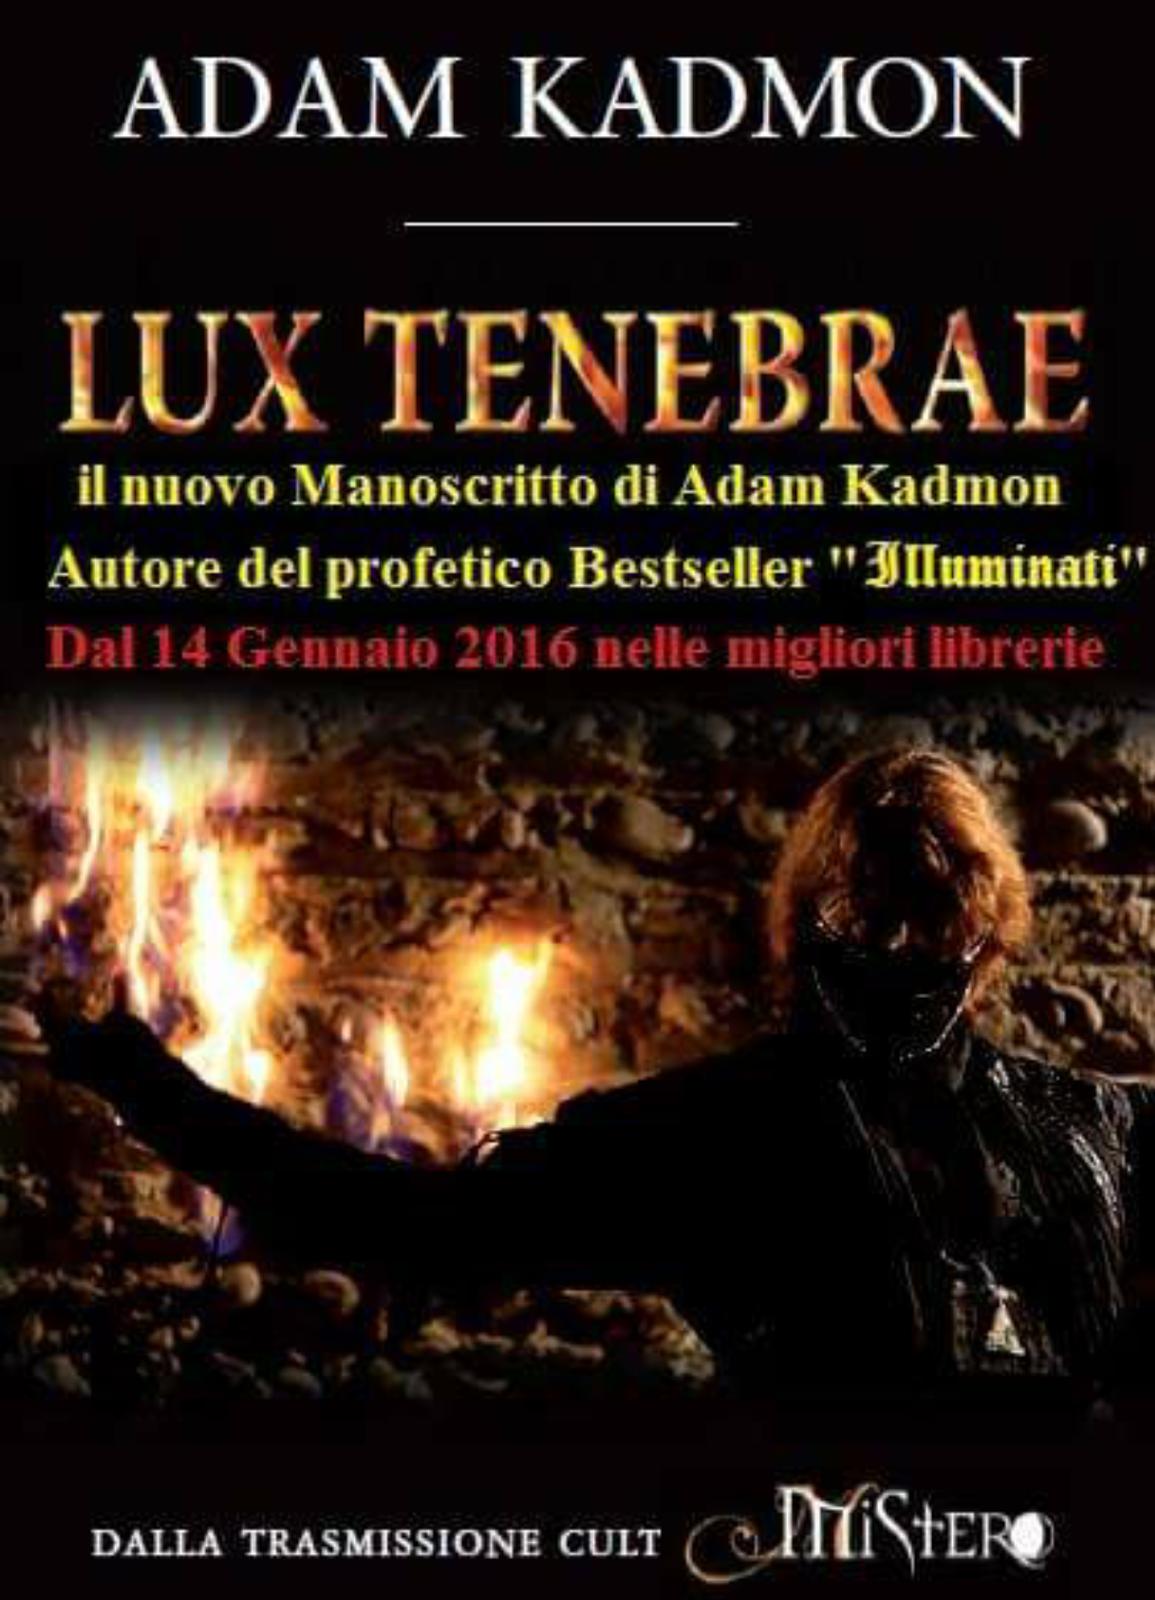 LUX TENEBRAE: Bestseller scritto da Adam Kadmon (2016).